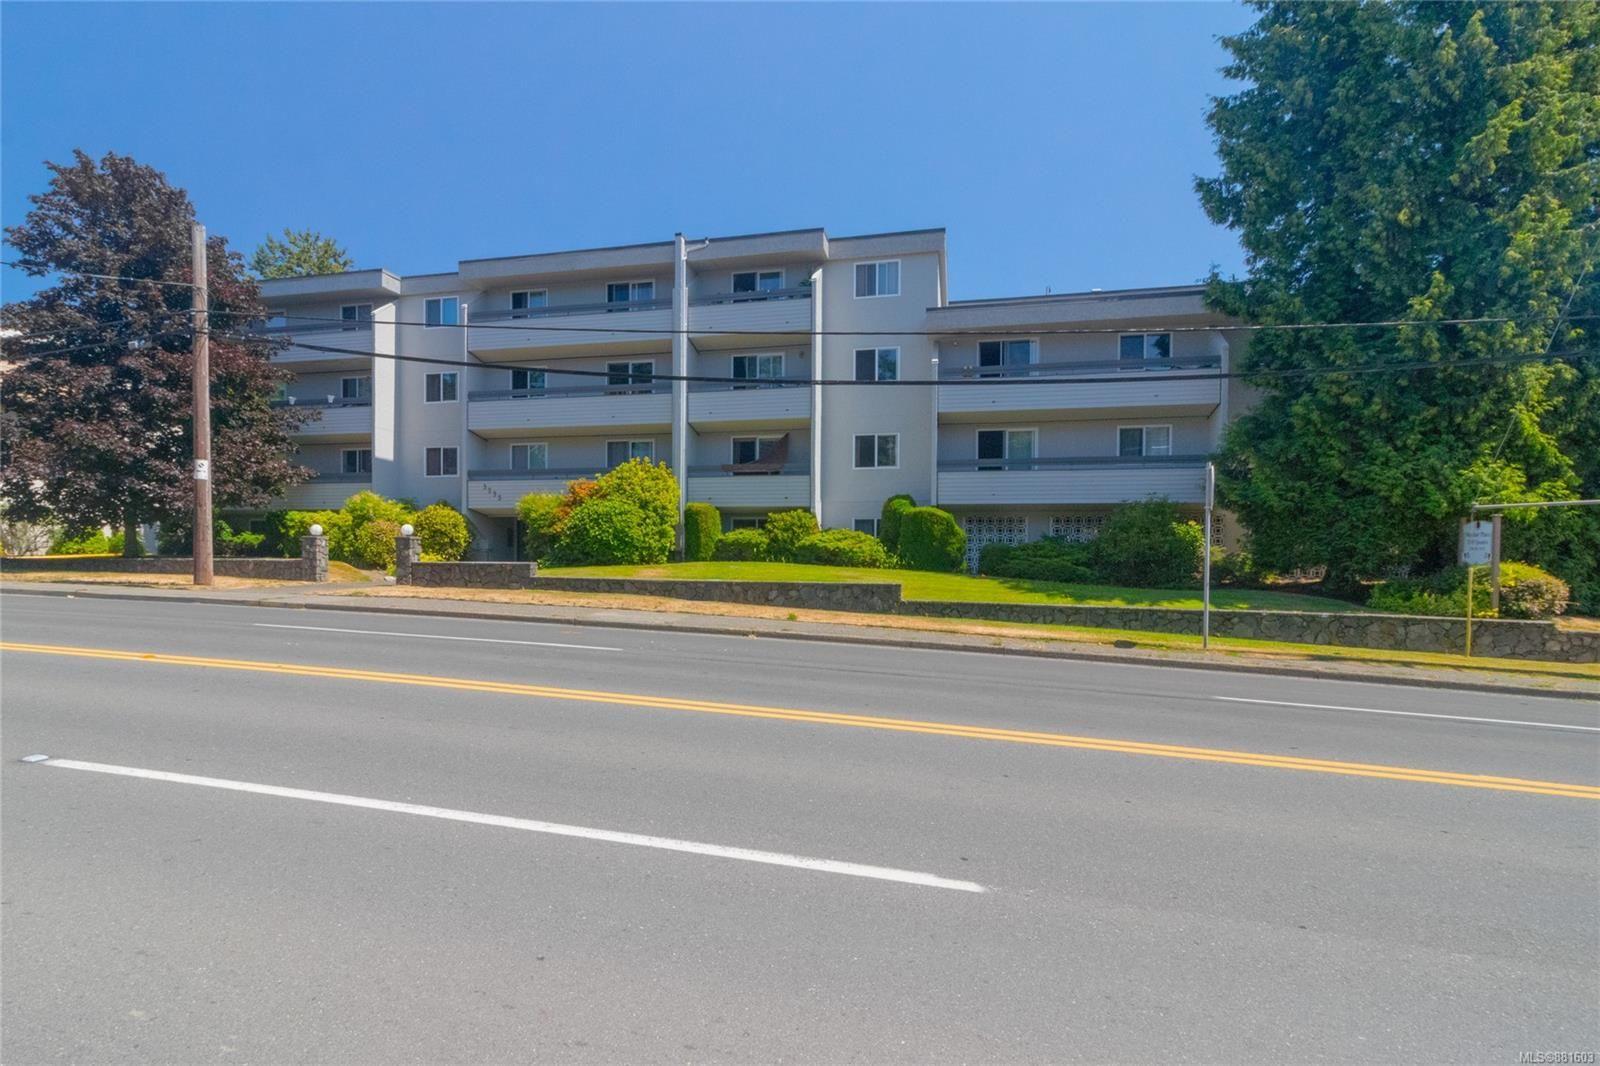 Main Photo: 102 3235 Quadra St in : SE Maplewood Condo for sale (Saanich East)  : MLS®# 881603